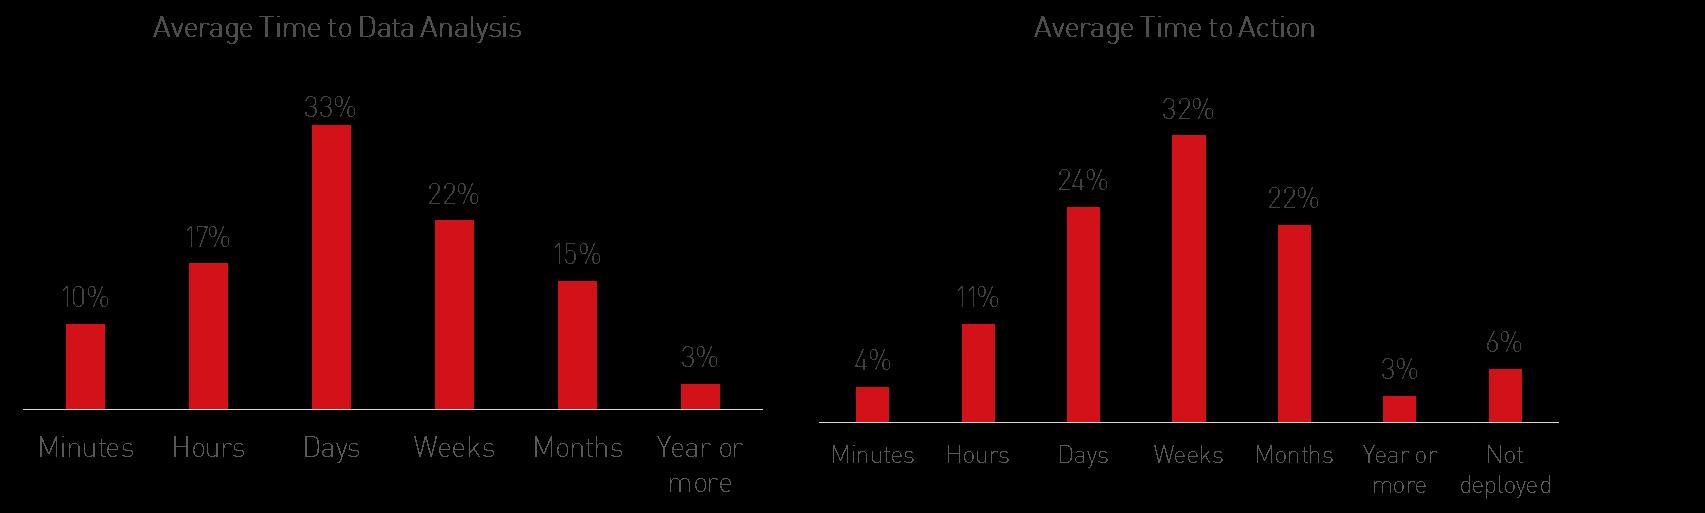 Rexer Analytics 2013 Data Miners Survey